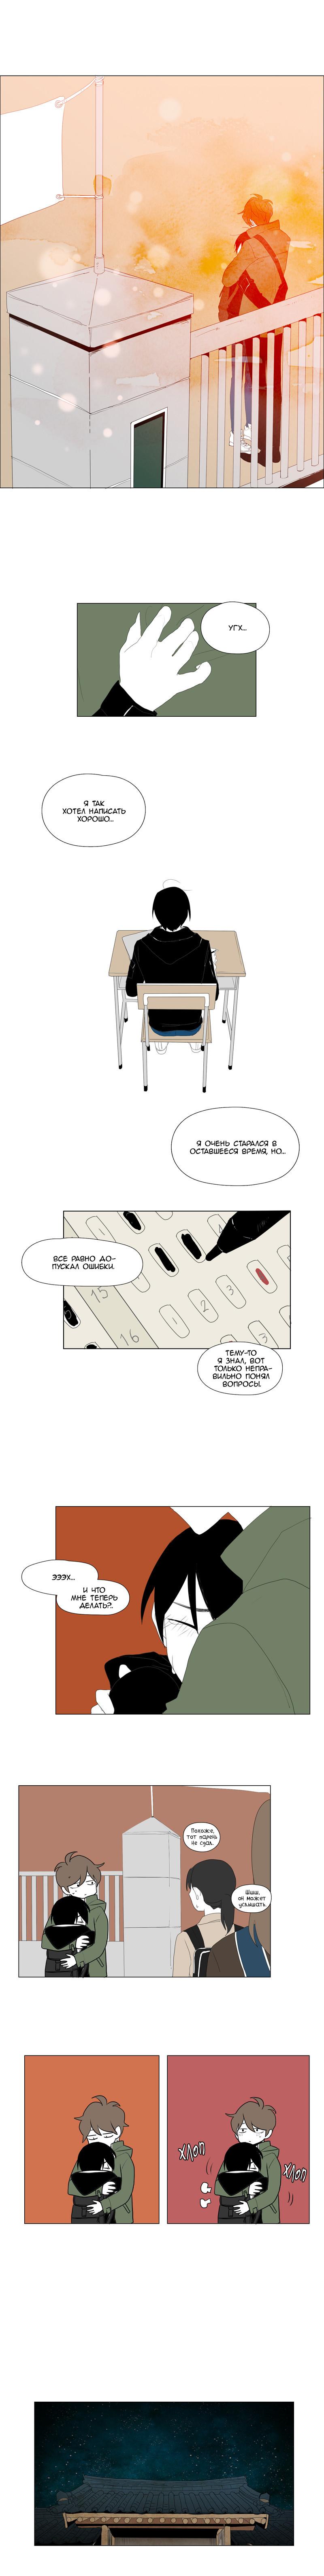 https://r1.ninemanga.com/comics/pic2/33/27873/314633/1482174975468.jpg Page 2